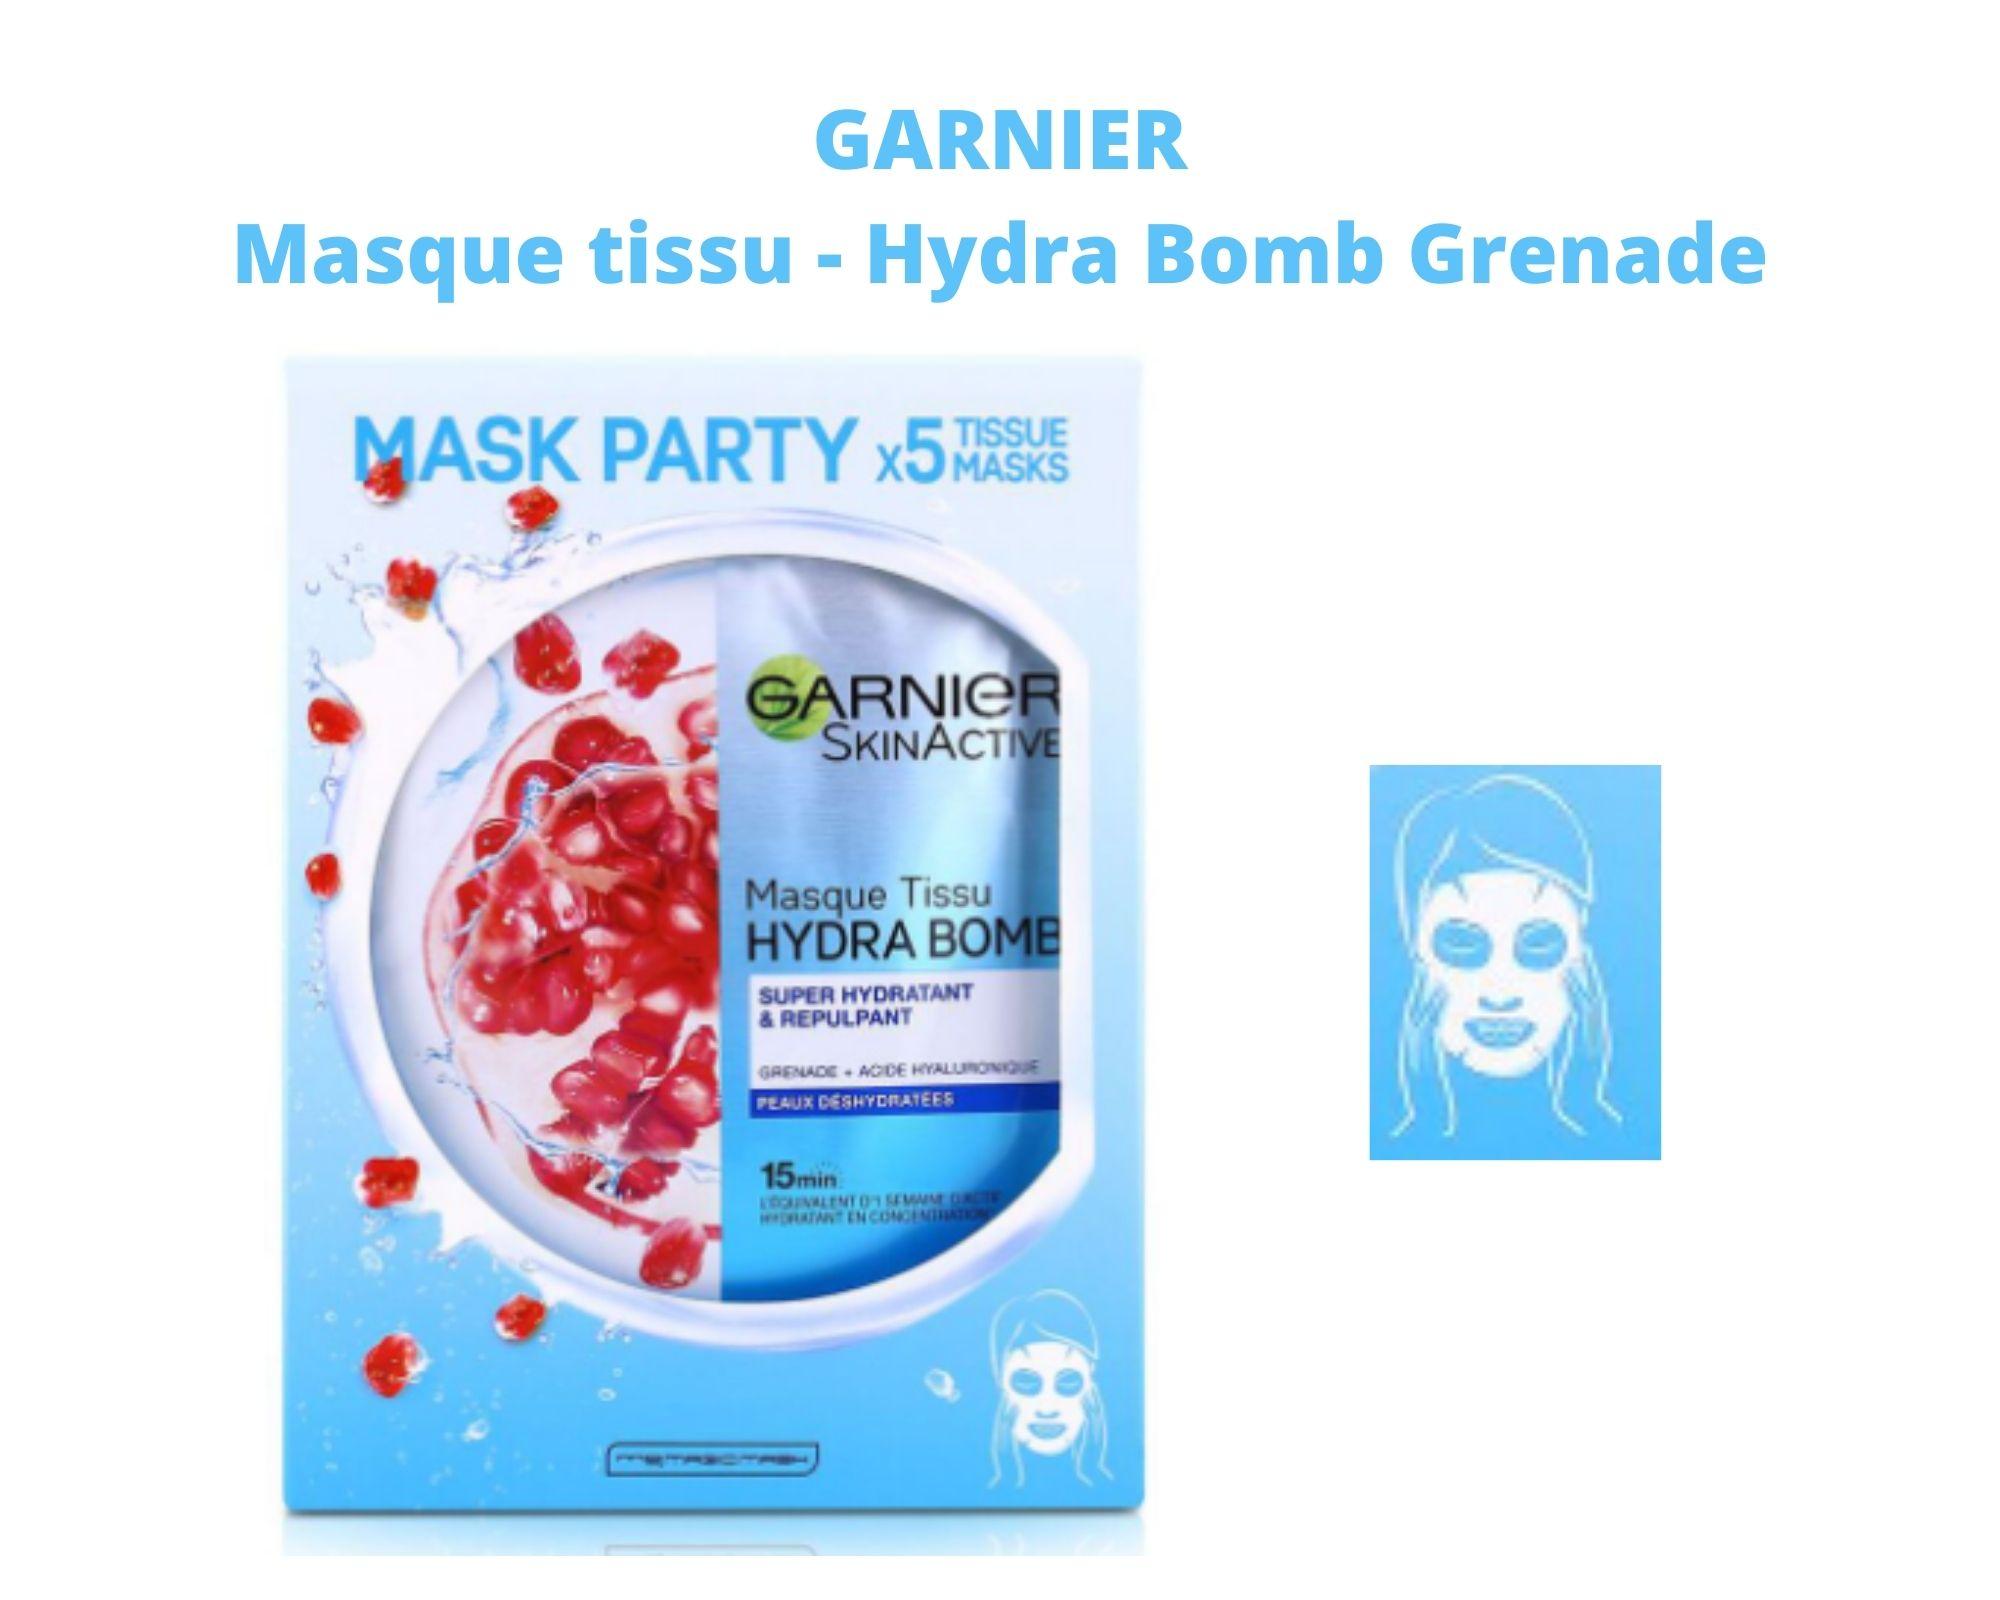 masque tissu sheet masque Hydra bomb garnier blog frivole et futile